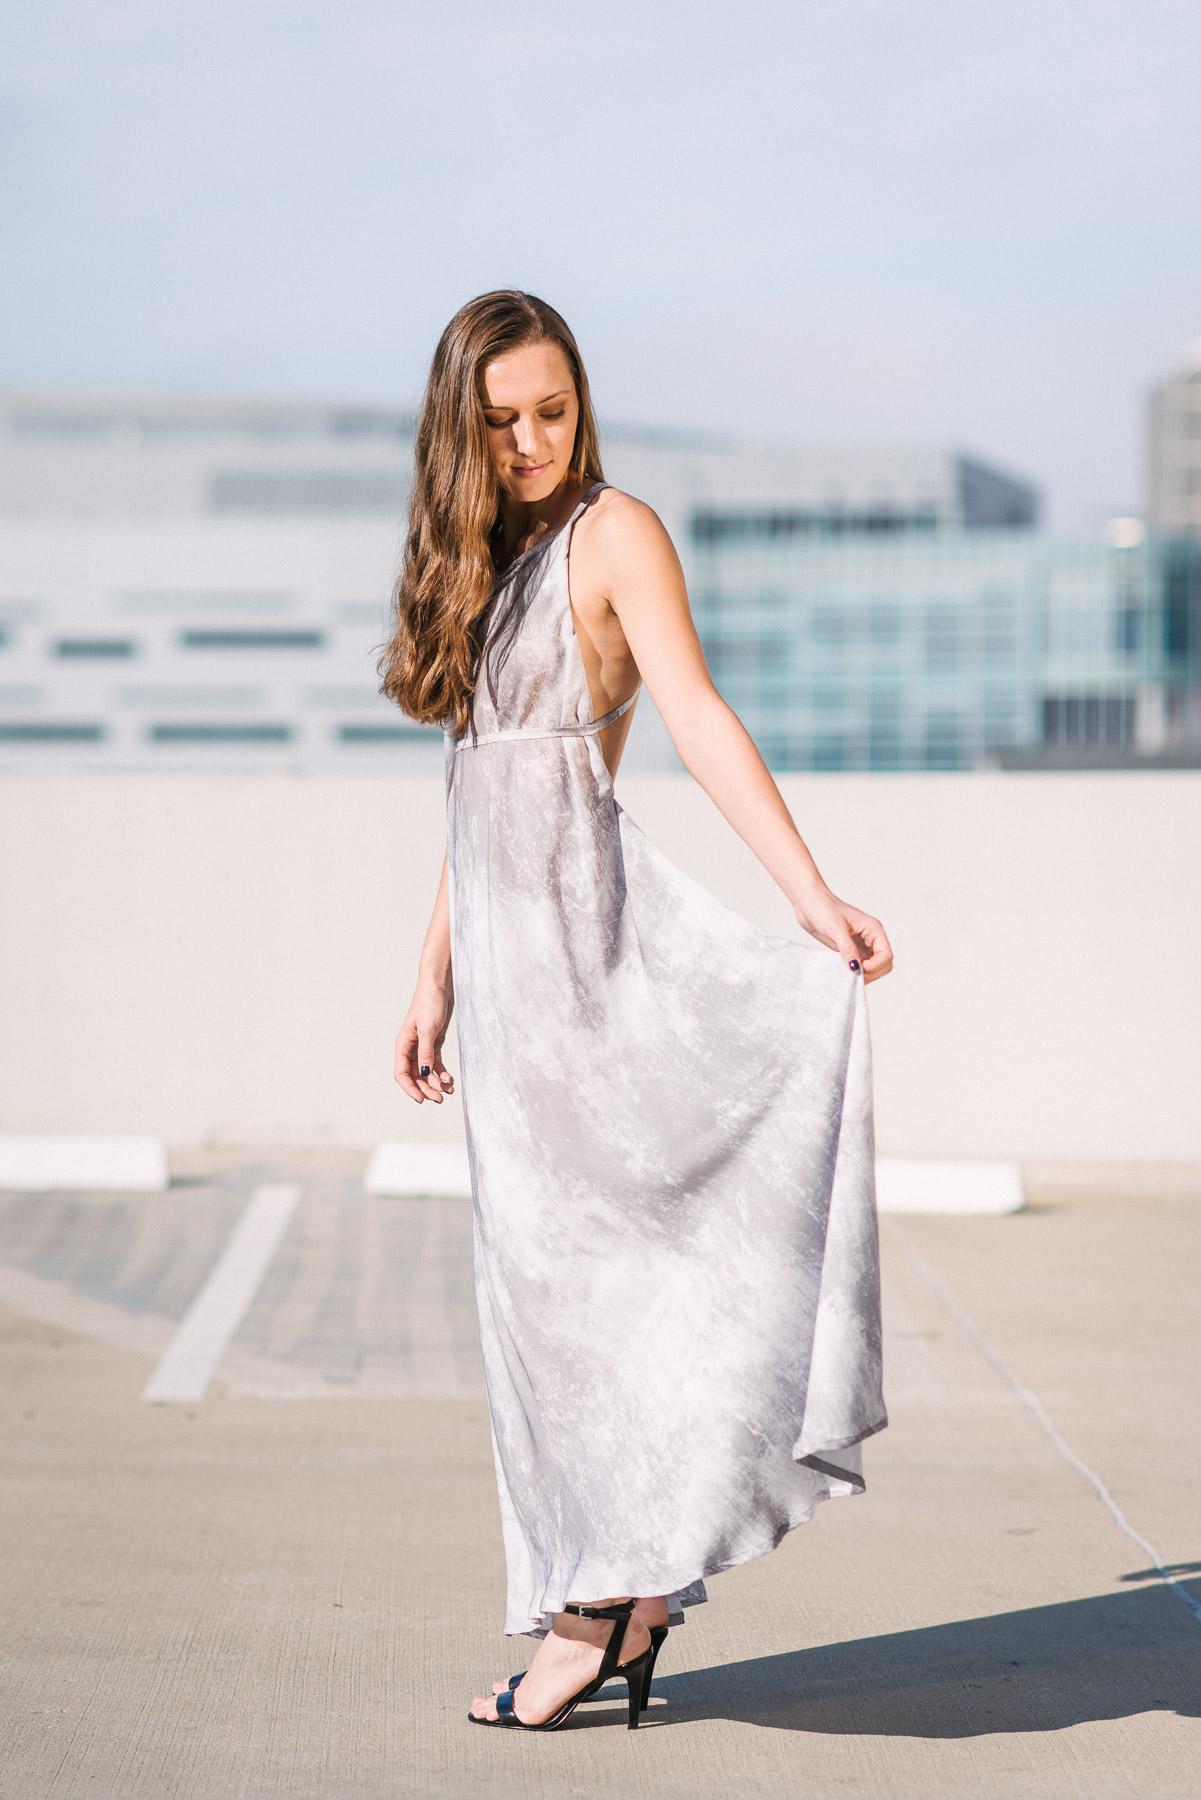 KateTaramykinStudios-Orlando-Fashion-Portraits-MID-22.jpg